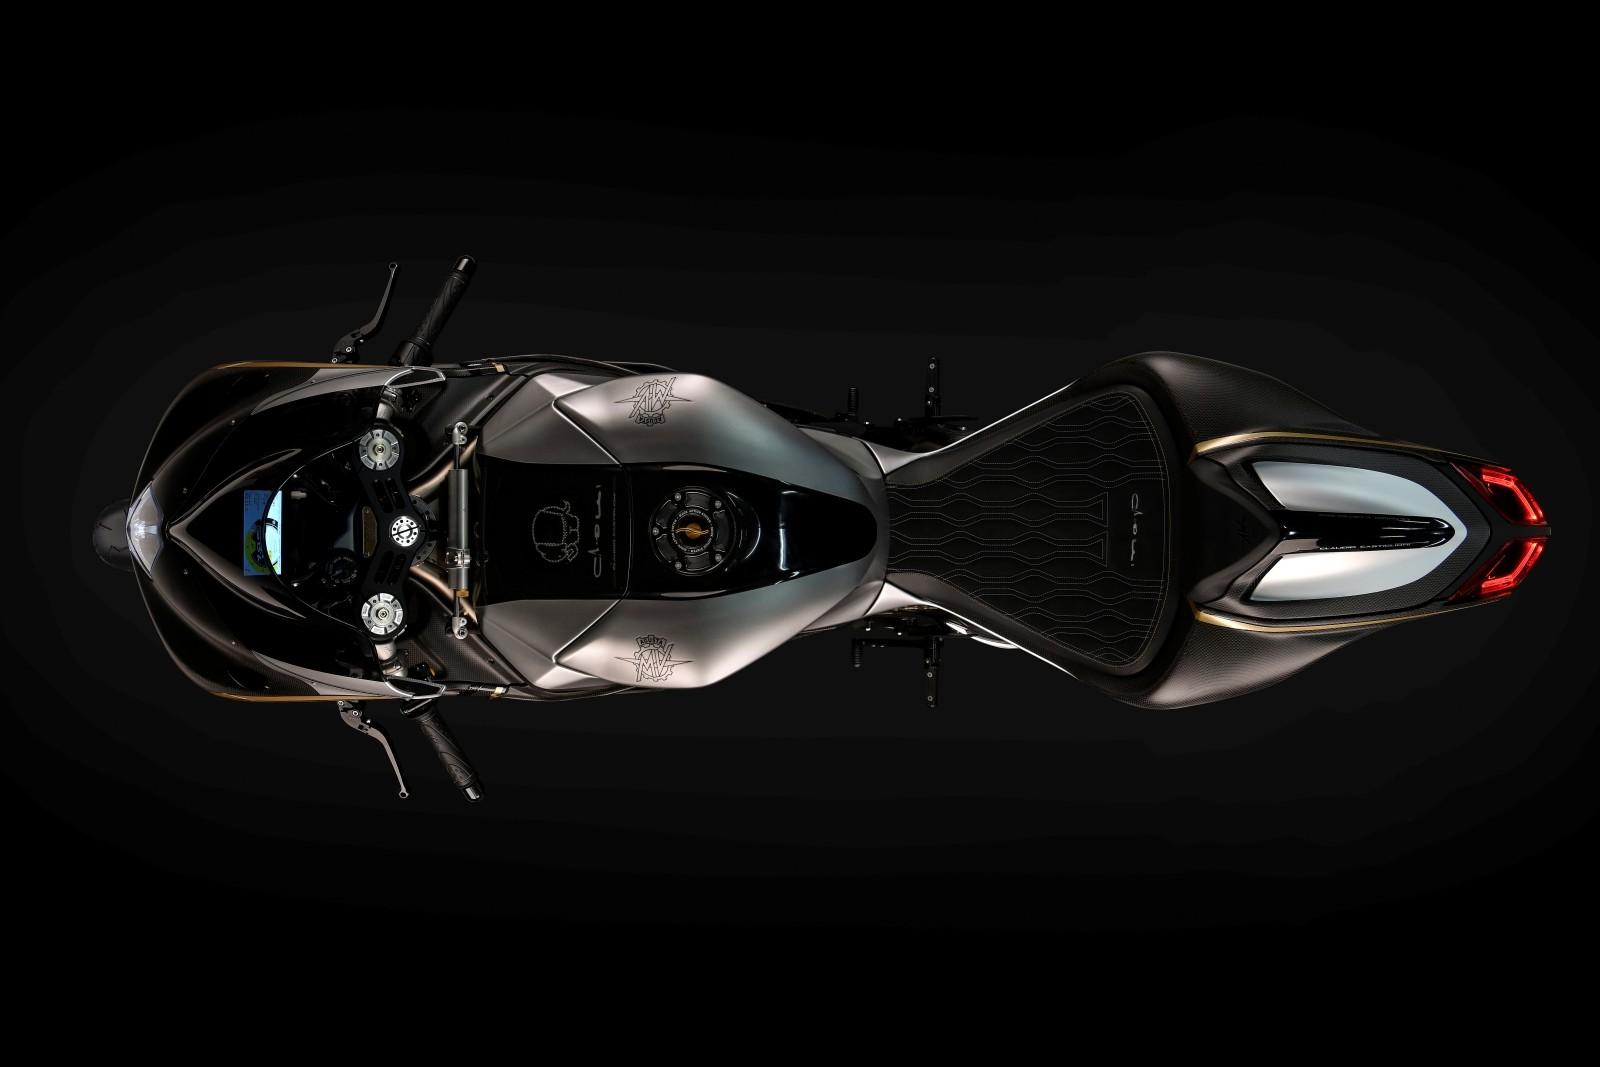 MV Agusta F4 Claudio 2019